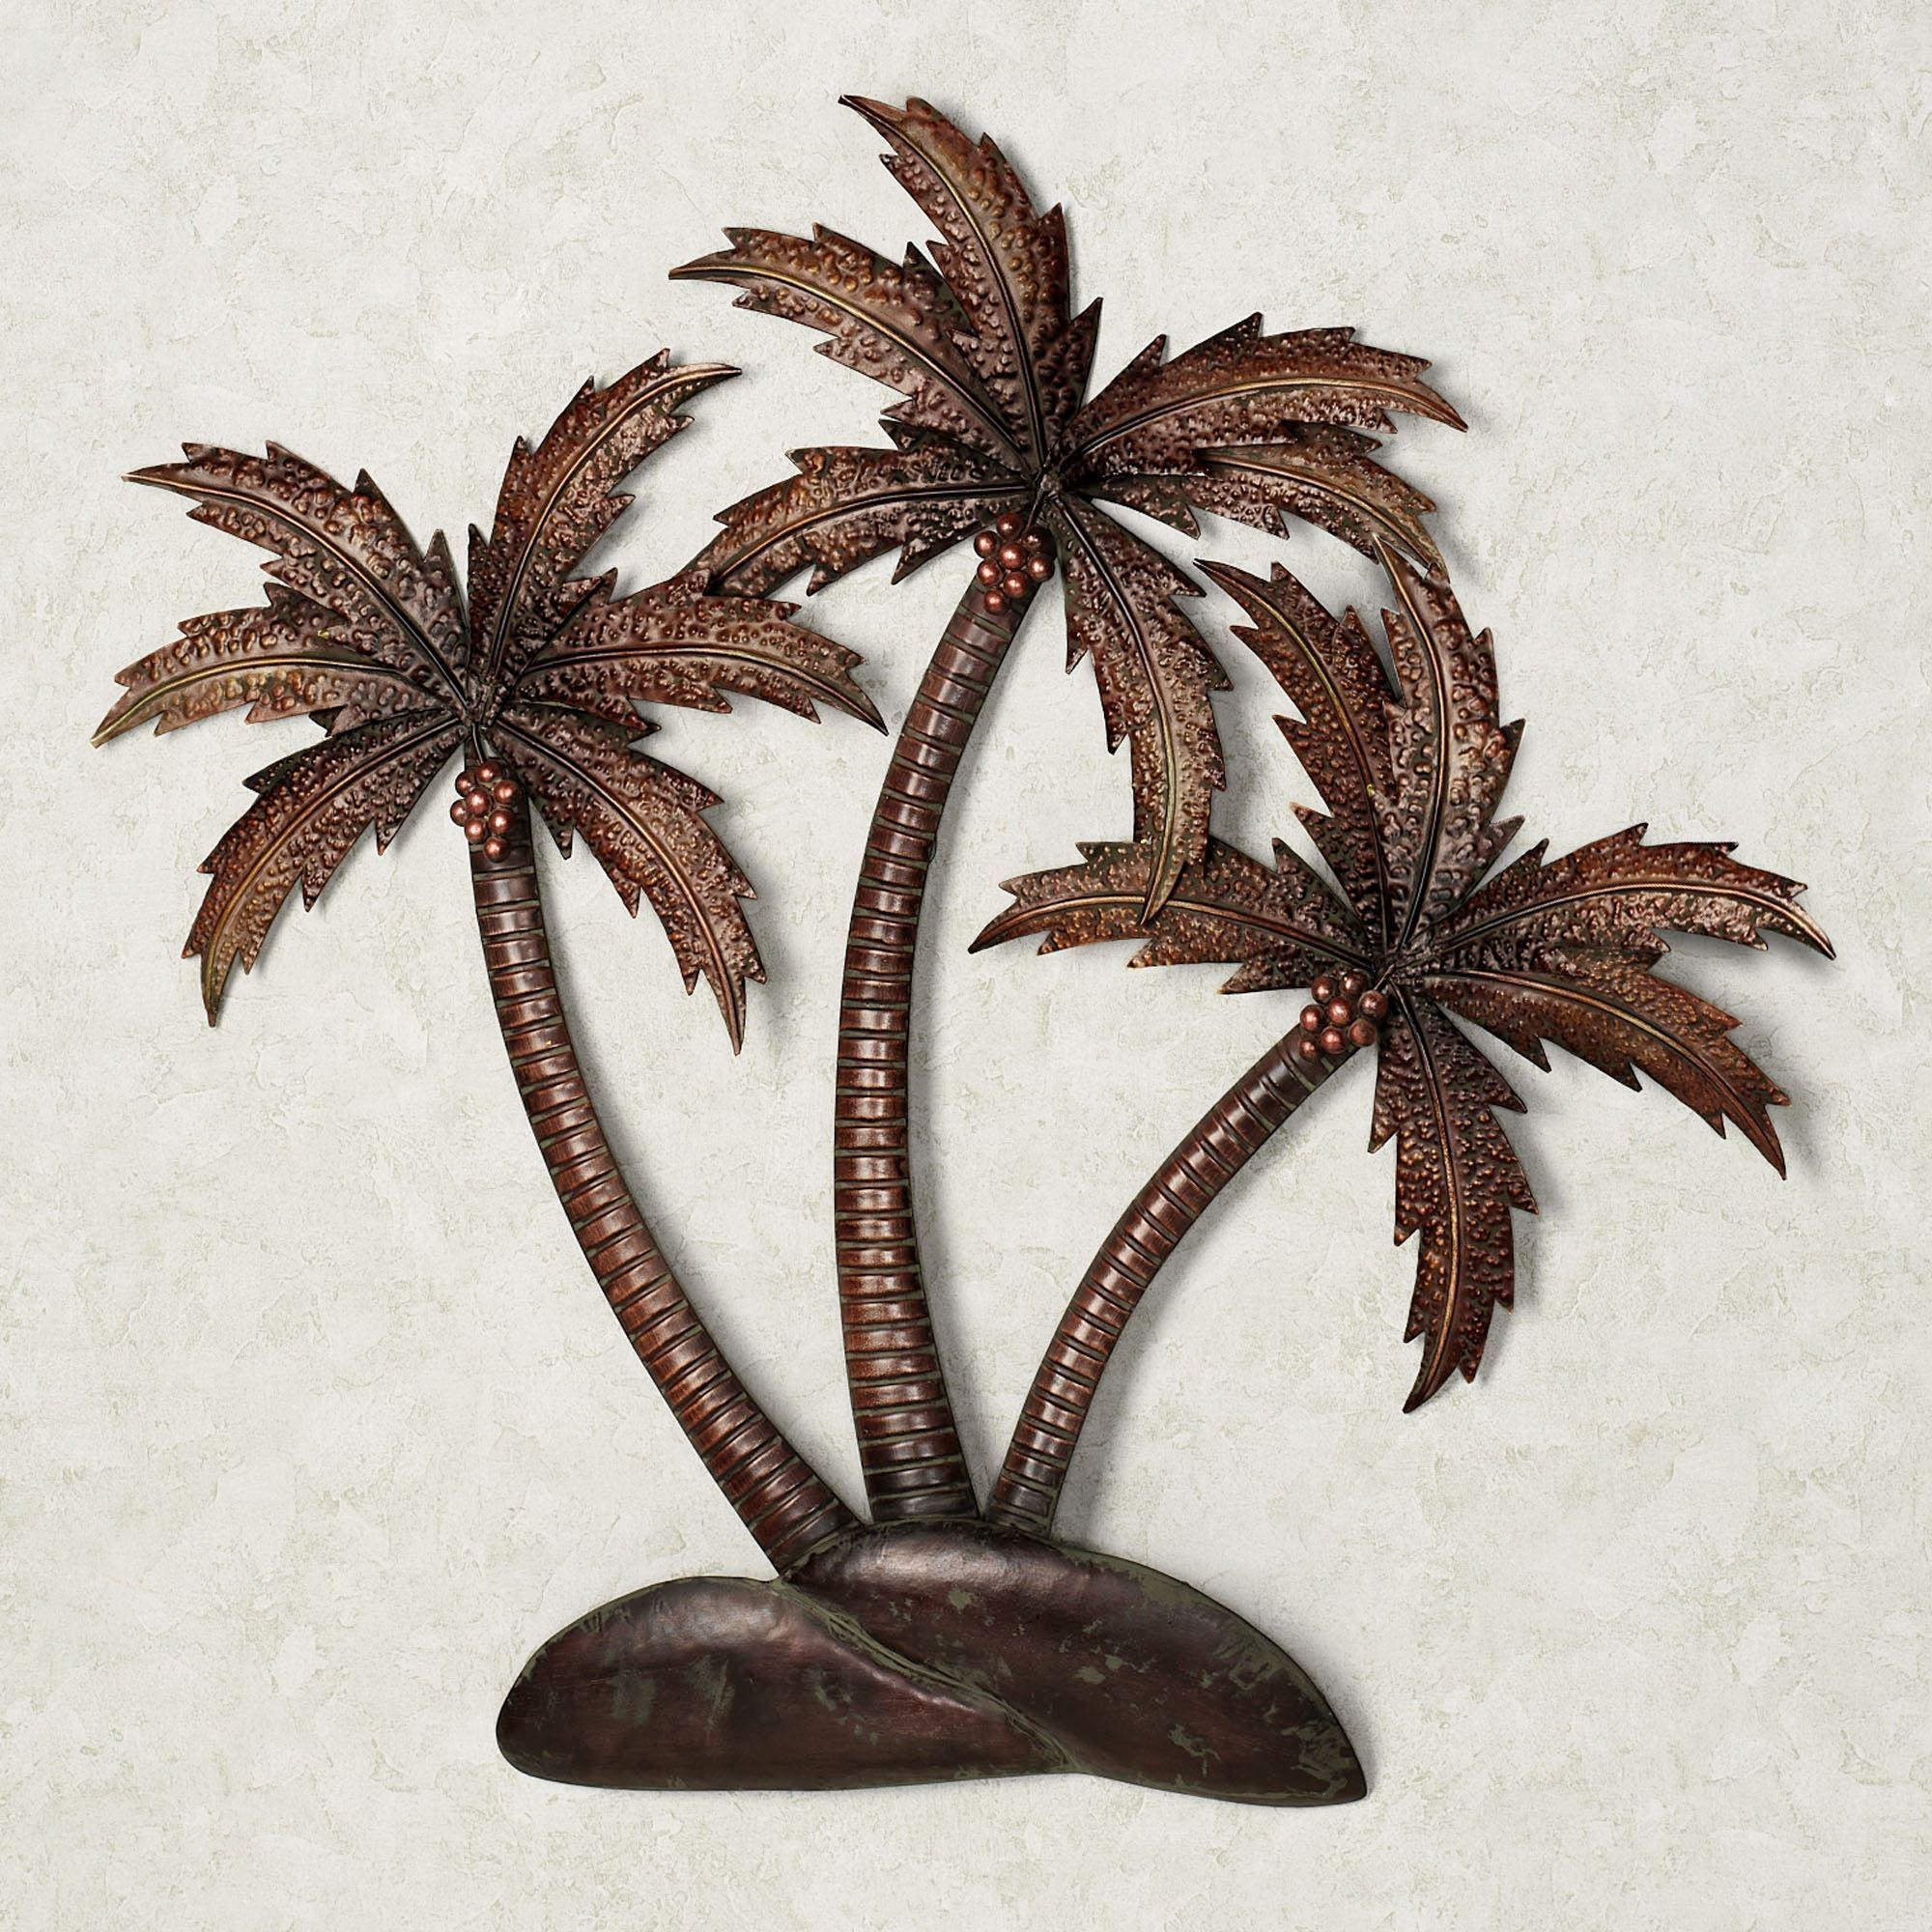 Palmiera Tropical Metal Wall Art Regarding Palm Leaf Wall Decor (Image 16 of 20)